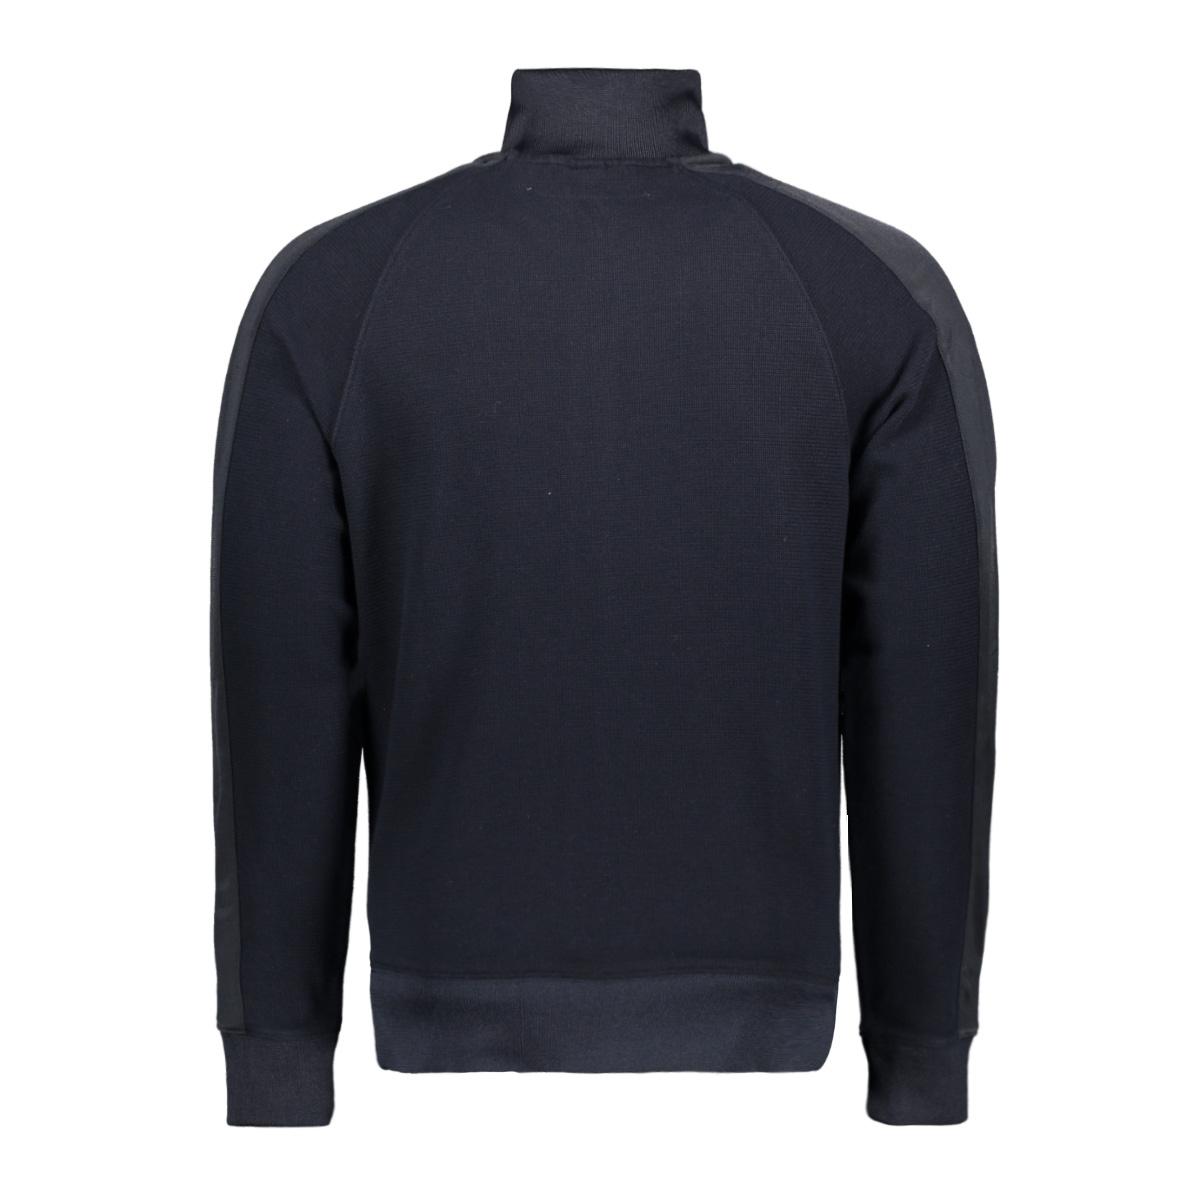 zipped pique cardigan csw195005 cast iron vest 5287